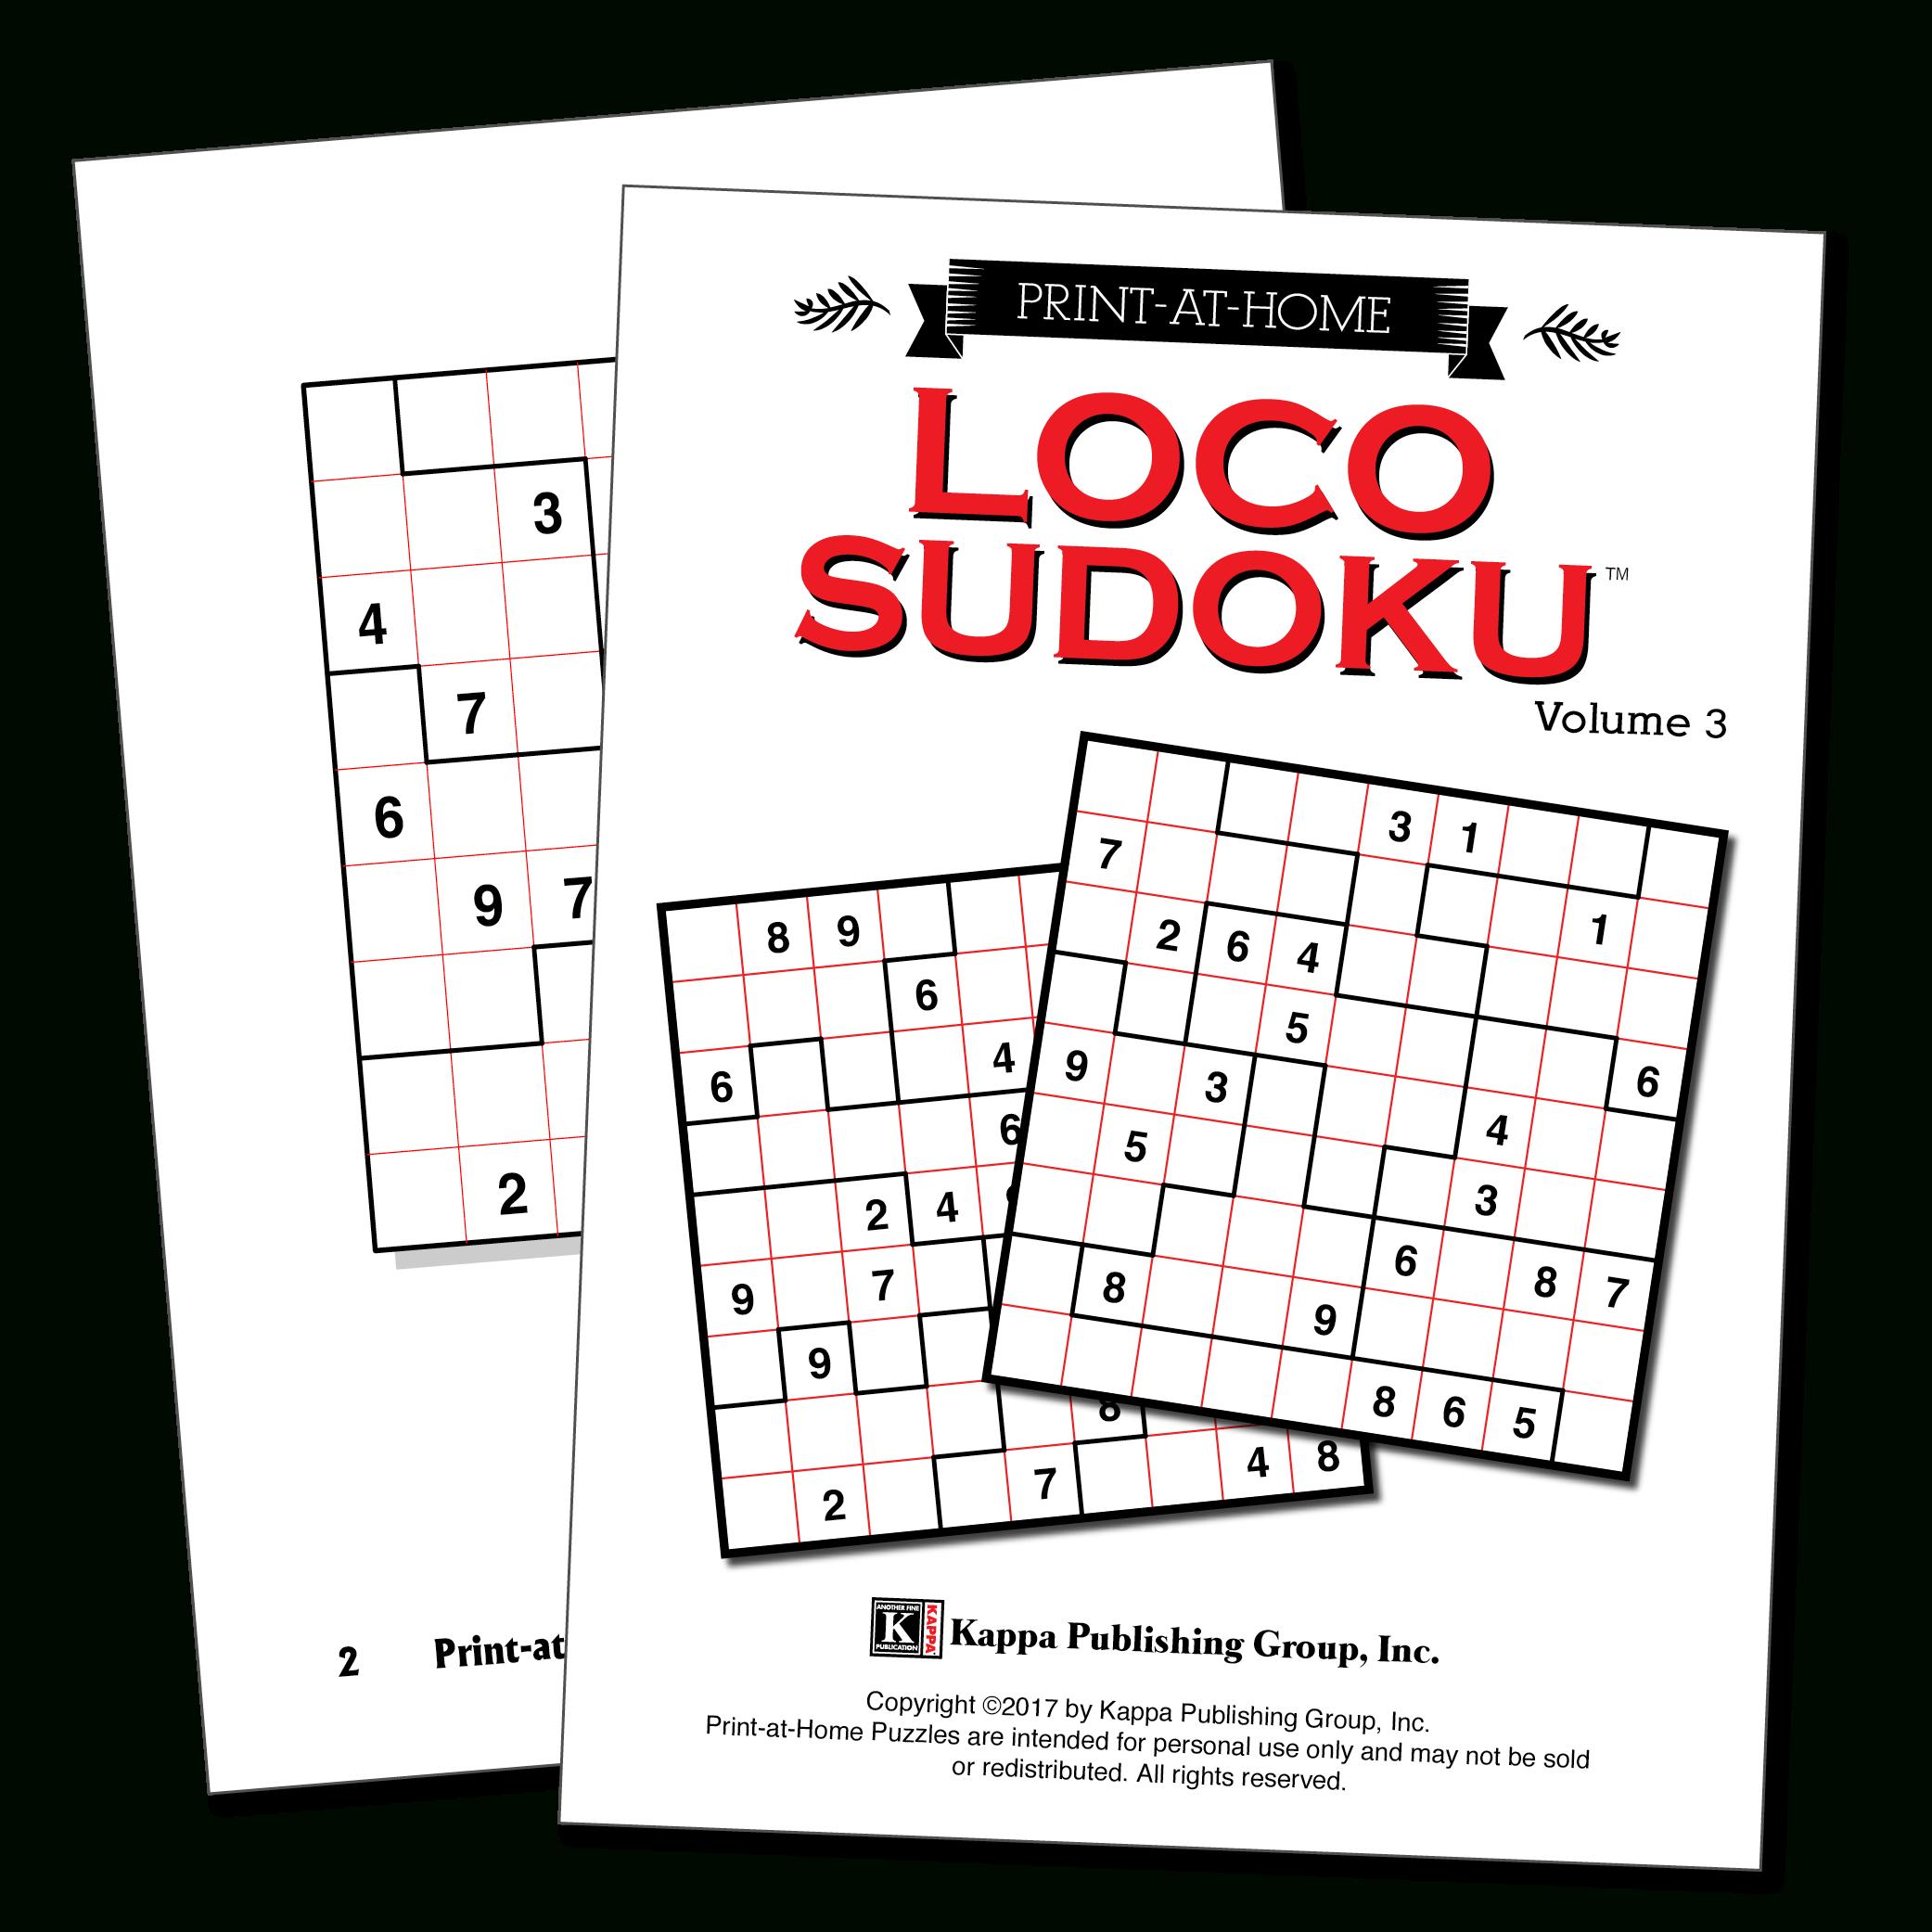 Print-At-Home Loco Sudoku – Kappa Puzzles - Printable Puzzle Packets